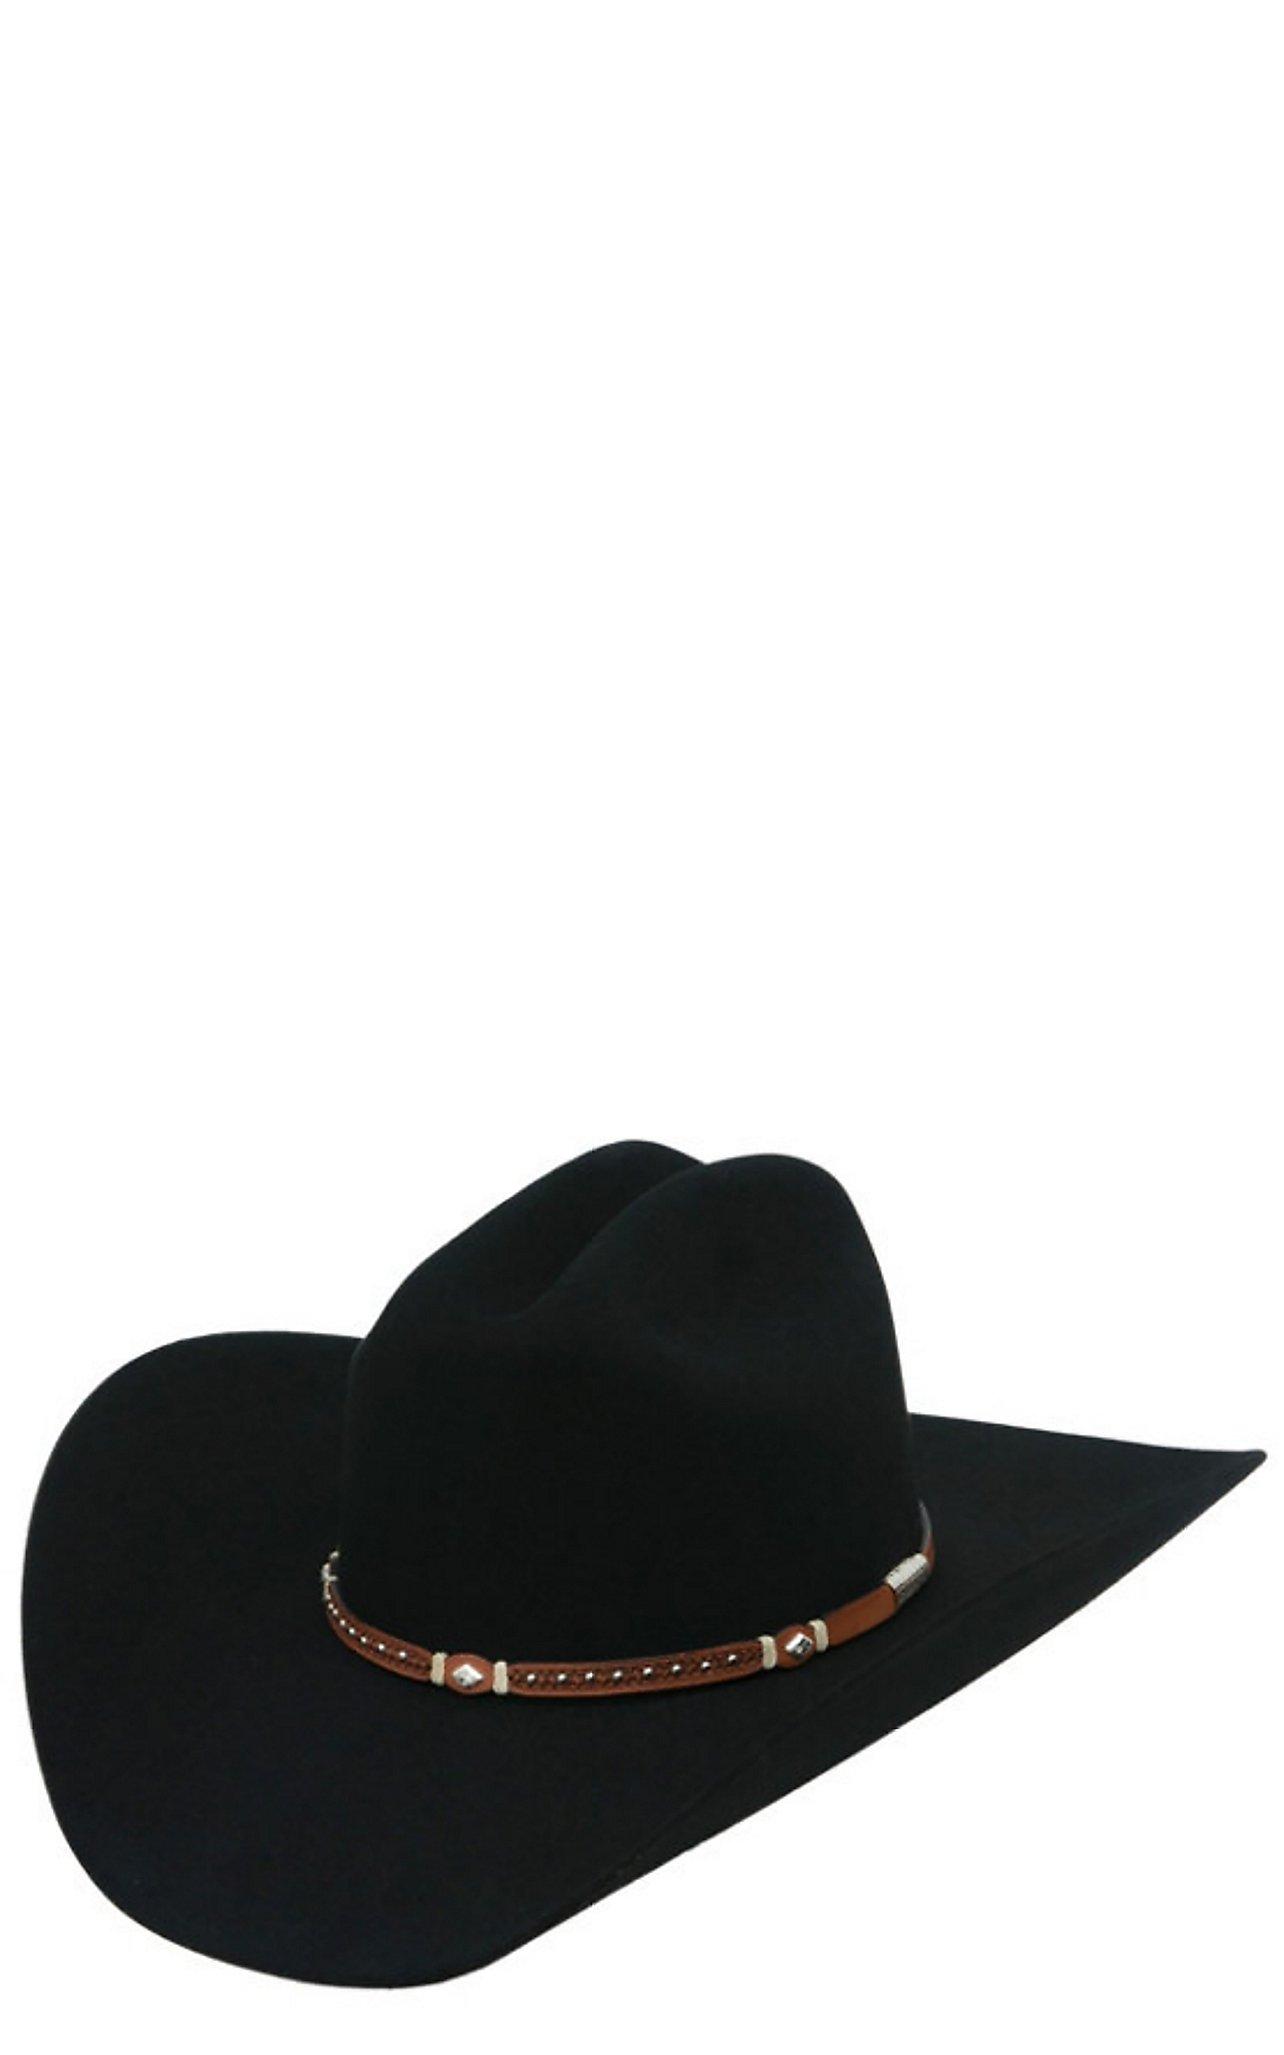 Stetson  Stetson 6X Monterrey T Black Felt Cowboy Hat 4794d904a91